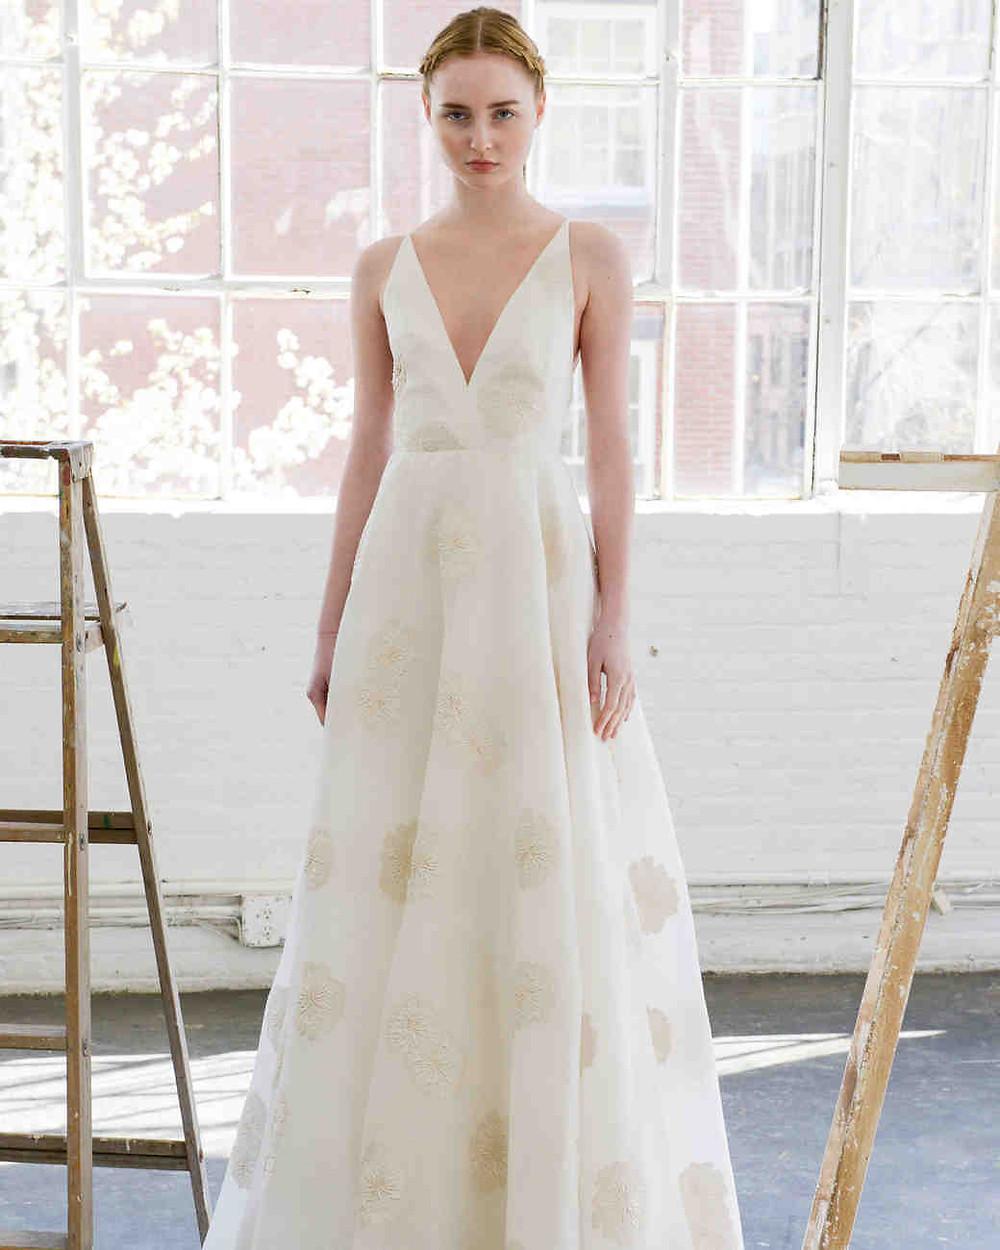 Lela Rose, Bridal Spring 2017, New York, April 14 2016